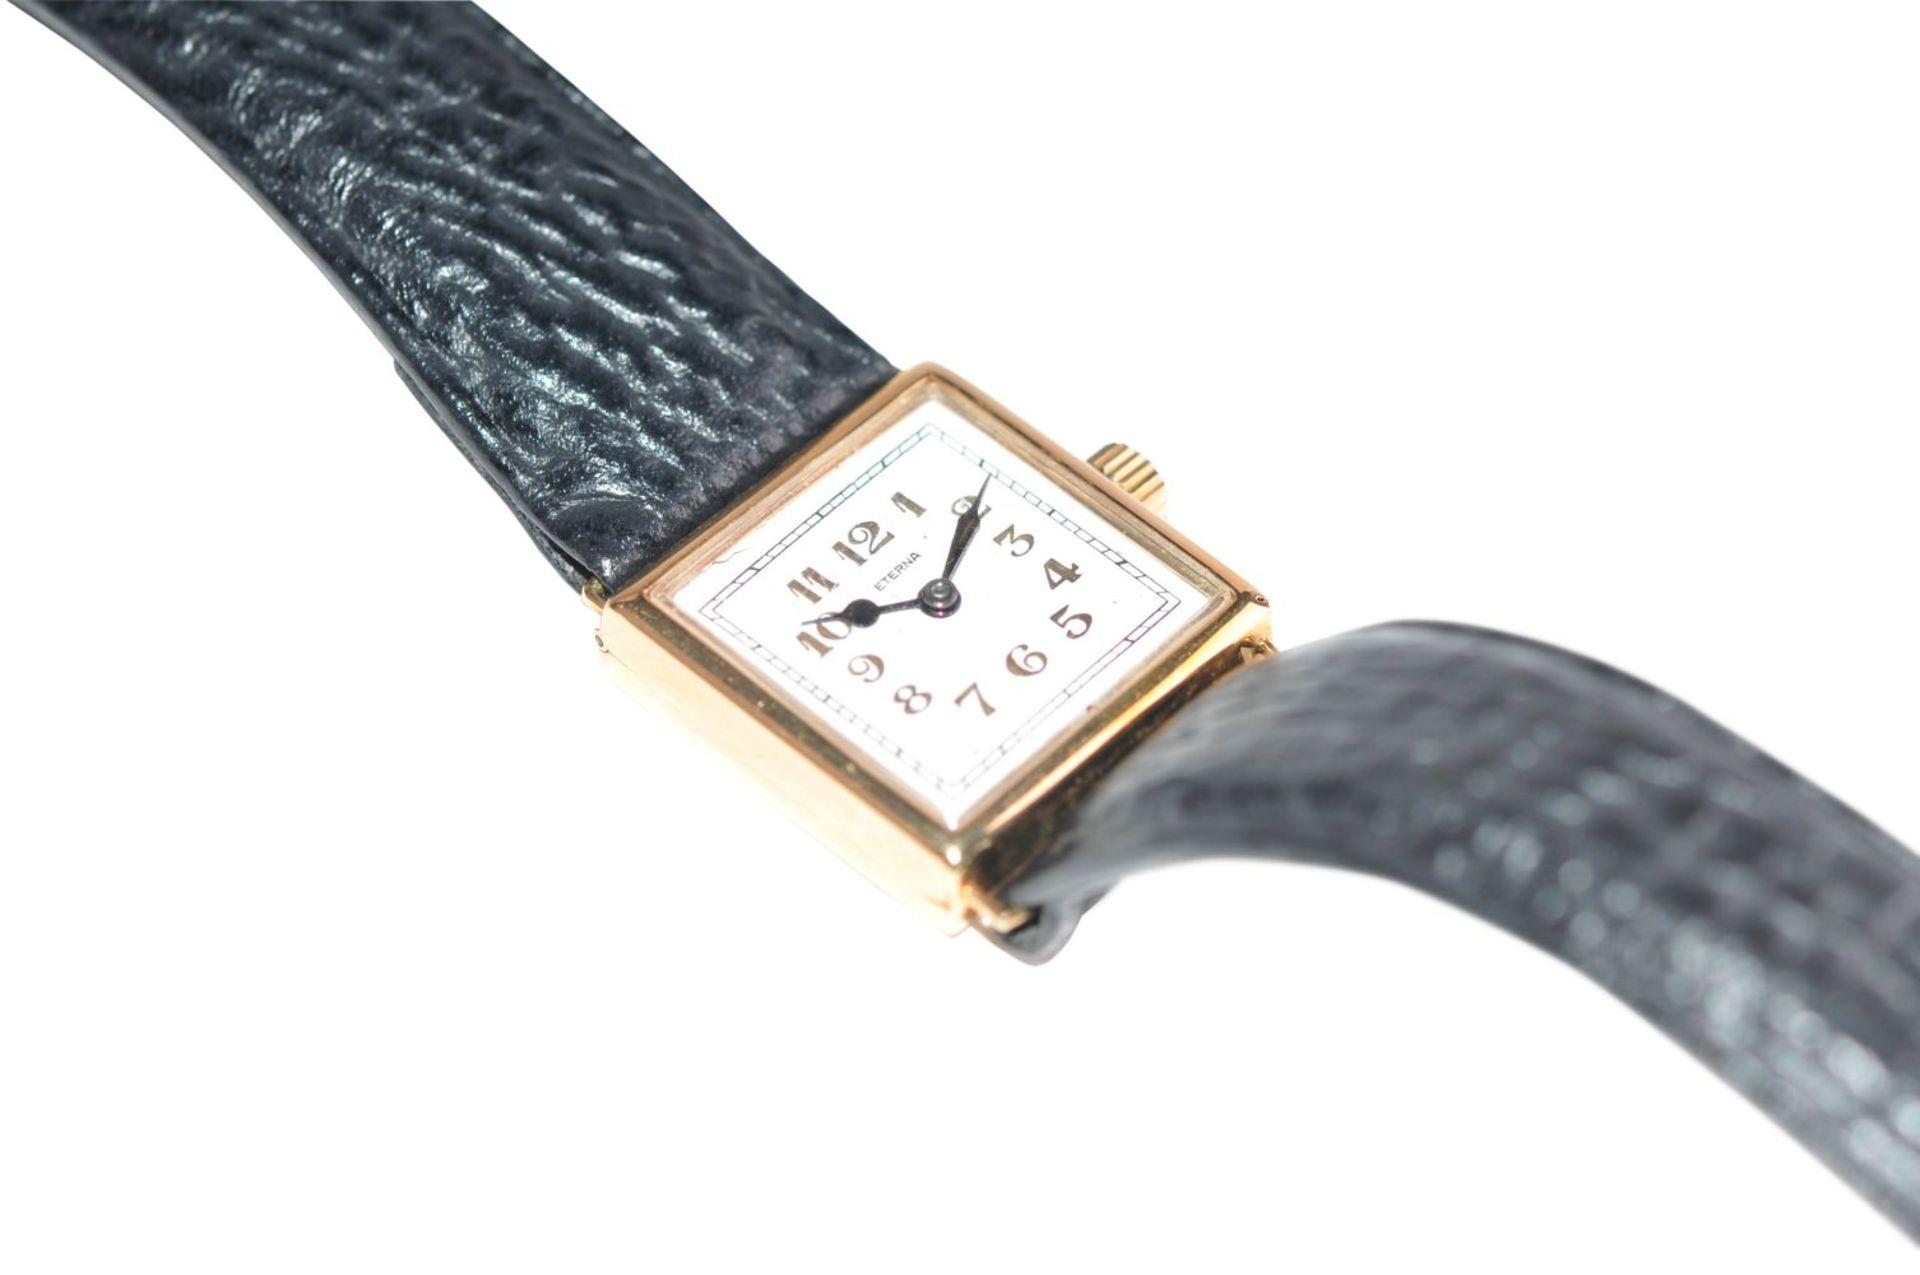 Los 10 - Eterna14 kt gold watch 24x24 mm on leather strap manual windingEterna585/000fein, Golduhr 24x24 mm